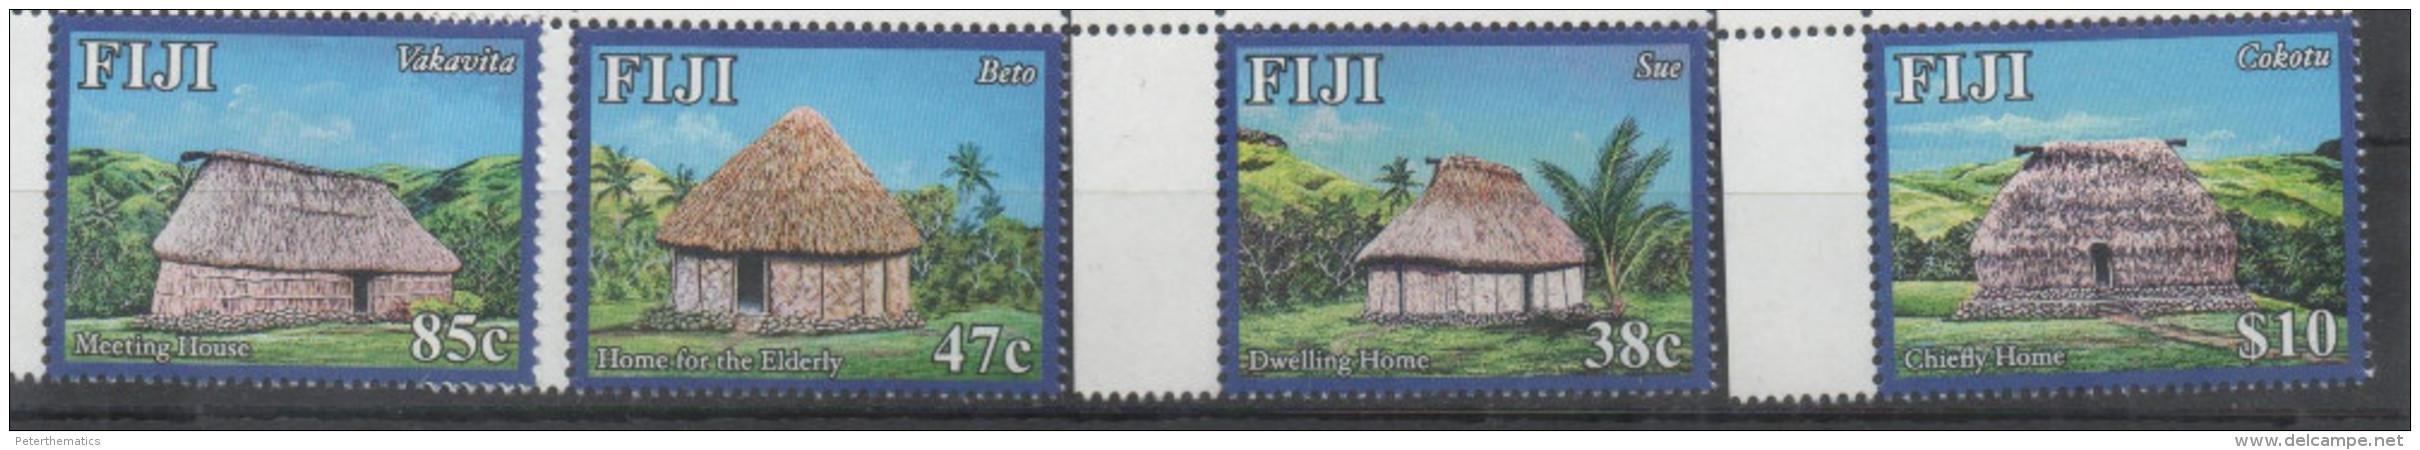 FIJI , 2016, MNH,HUTS, TREES, MOUNTAINS, DWELLINGS, 4v - Architecture